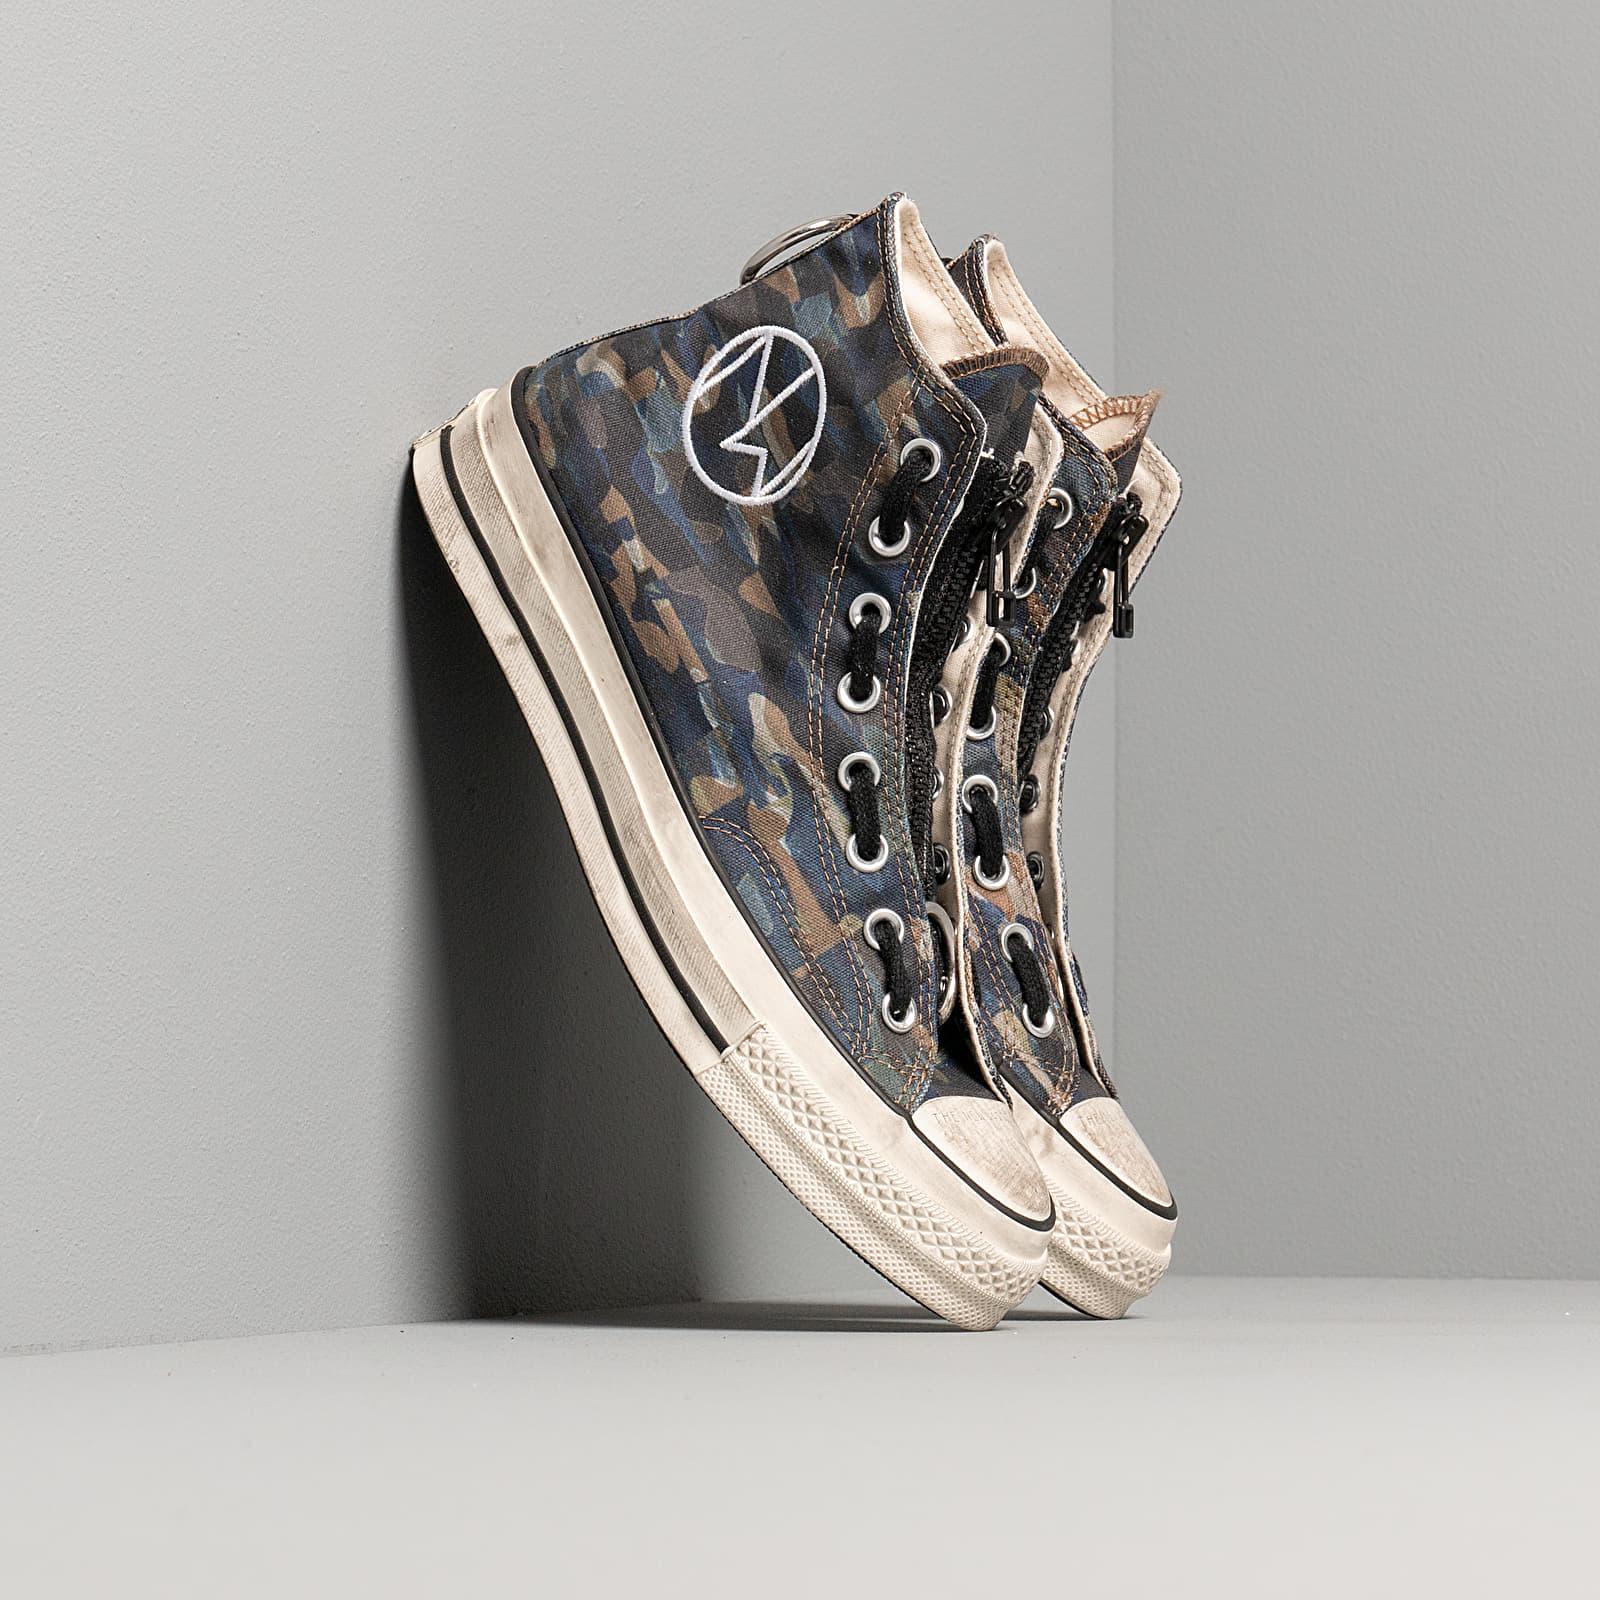 altavoz calculadora adolescentes  Men's shoes Converse x Undercover Chuck 70 Hi Black/ White/ Egret | Footshop